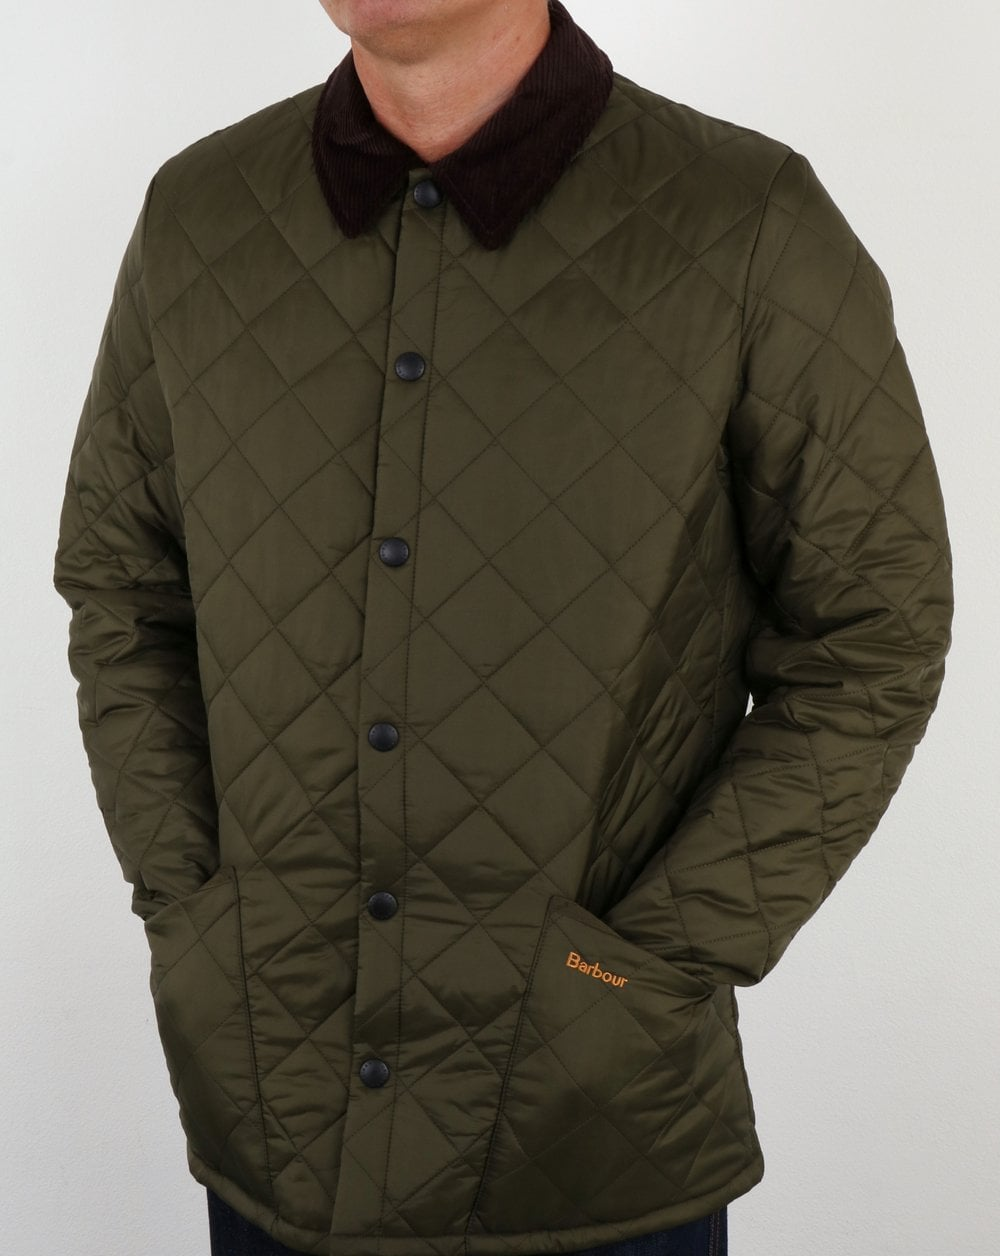 Barbour Heritage Liddesdale Quilted Jacket Olive Green